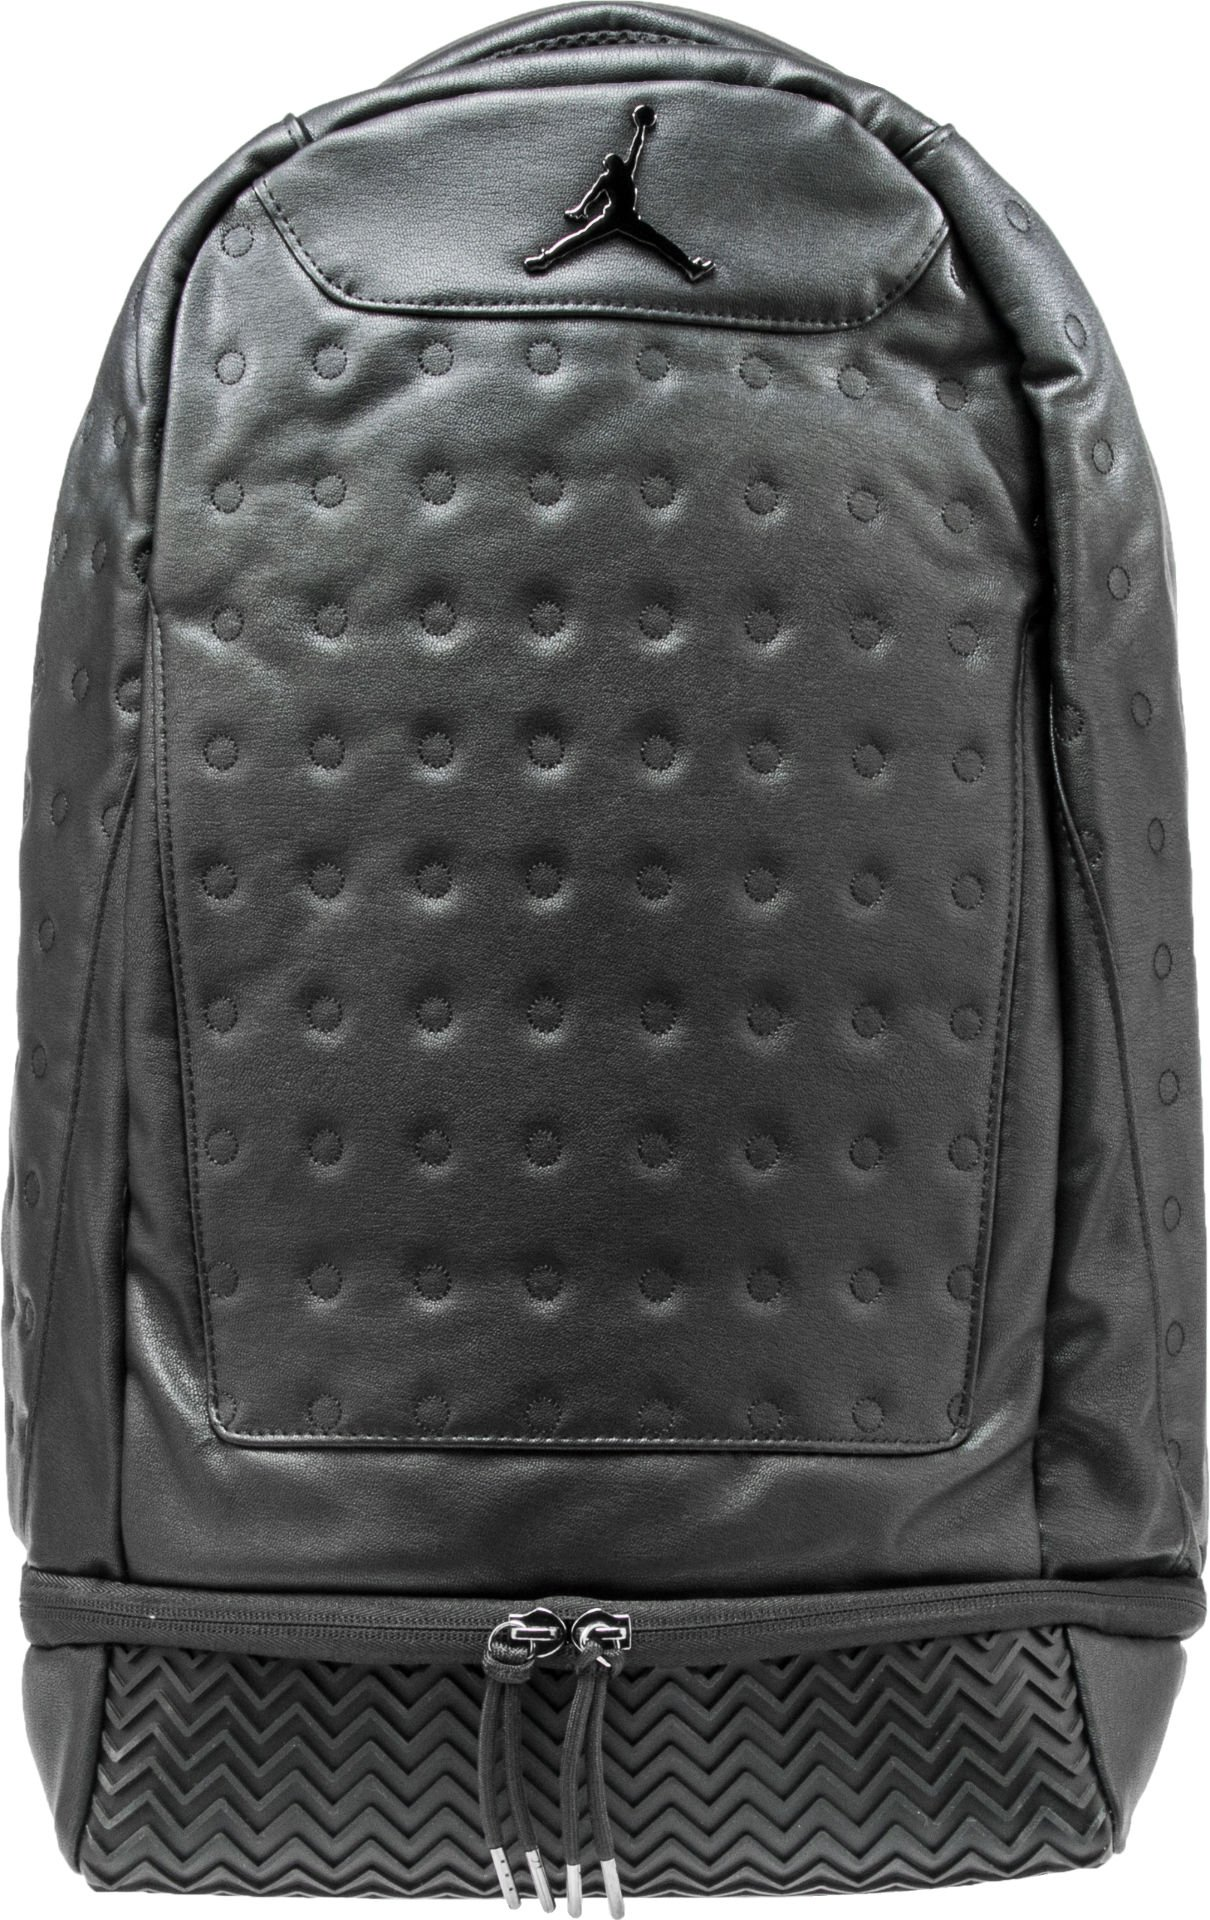 factory authentic ddd1b 752ff Nike Air Jordan Retro 13 Backpack - Black 9a1898 023